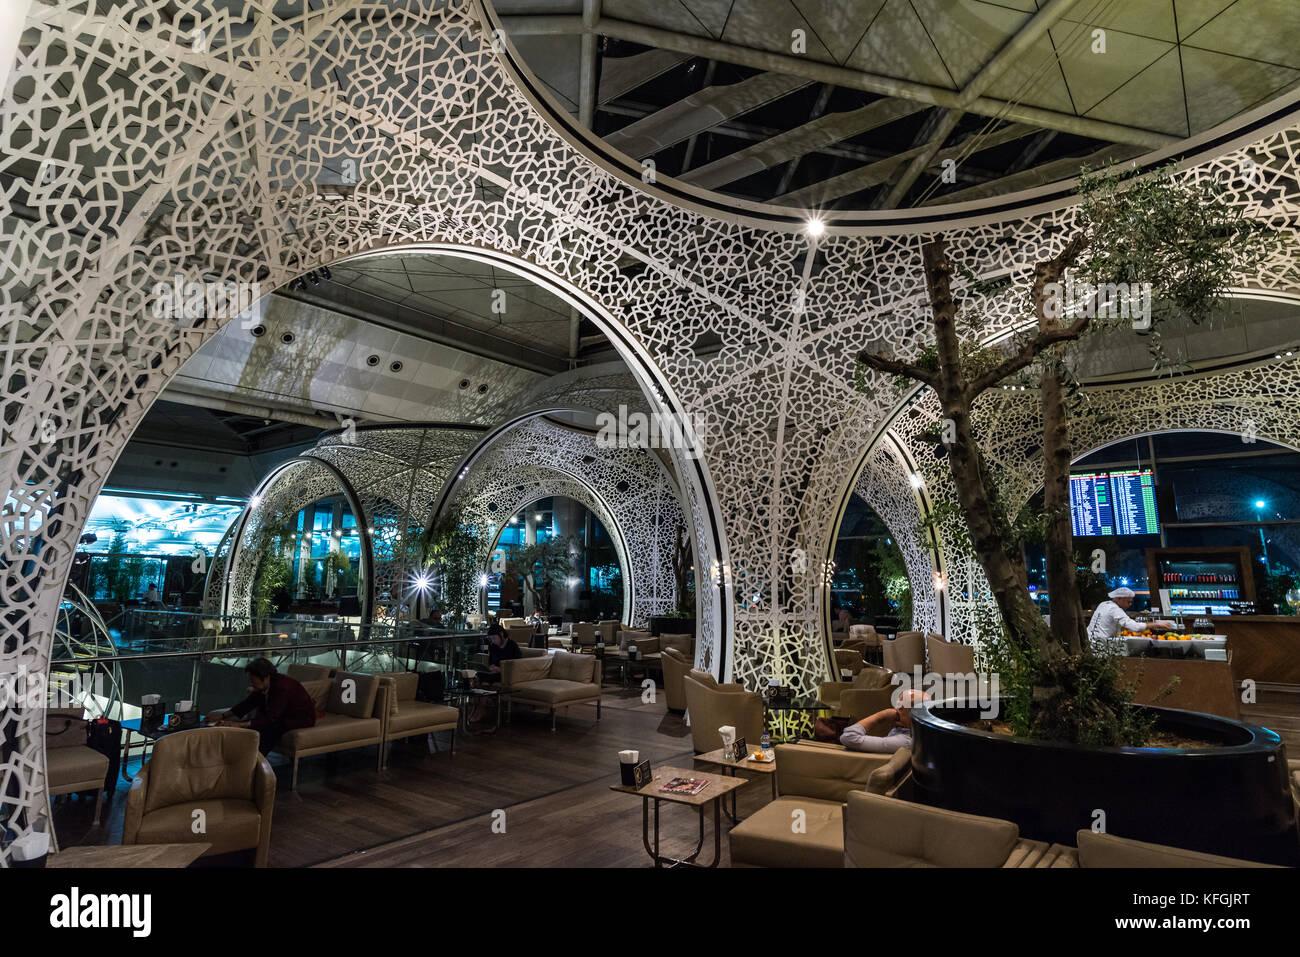 Interior Of Turkish Airline Premier Lounge. Istanbul Airport, Turkey.